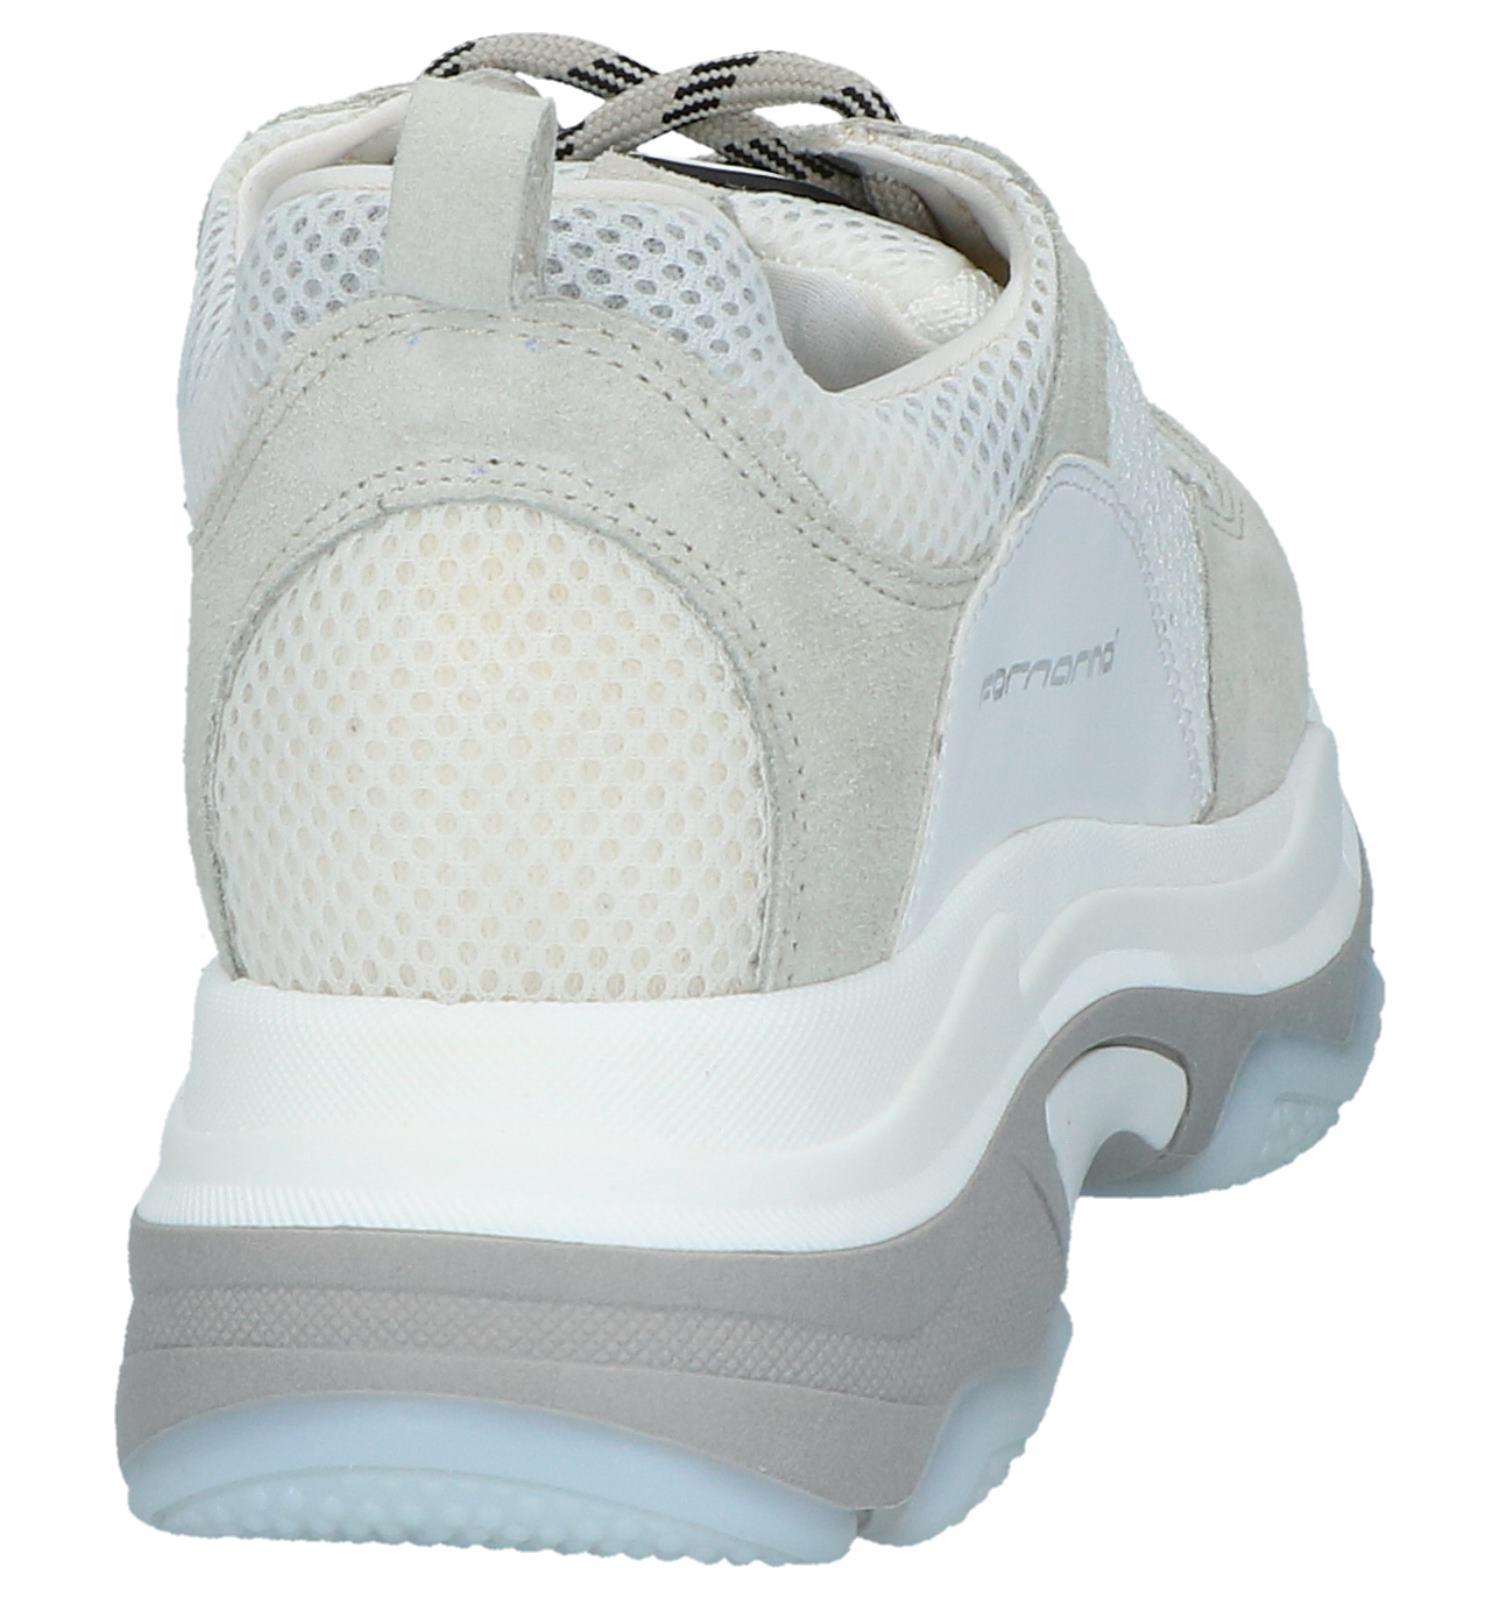 Sneakers Fornarina Super Fornarina Super Witte Pn8OX0wk